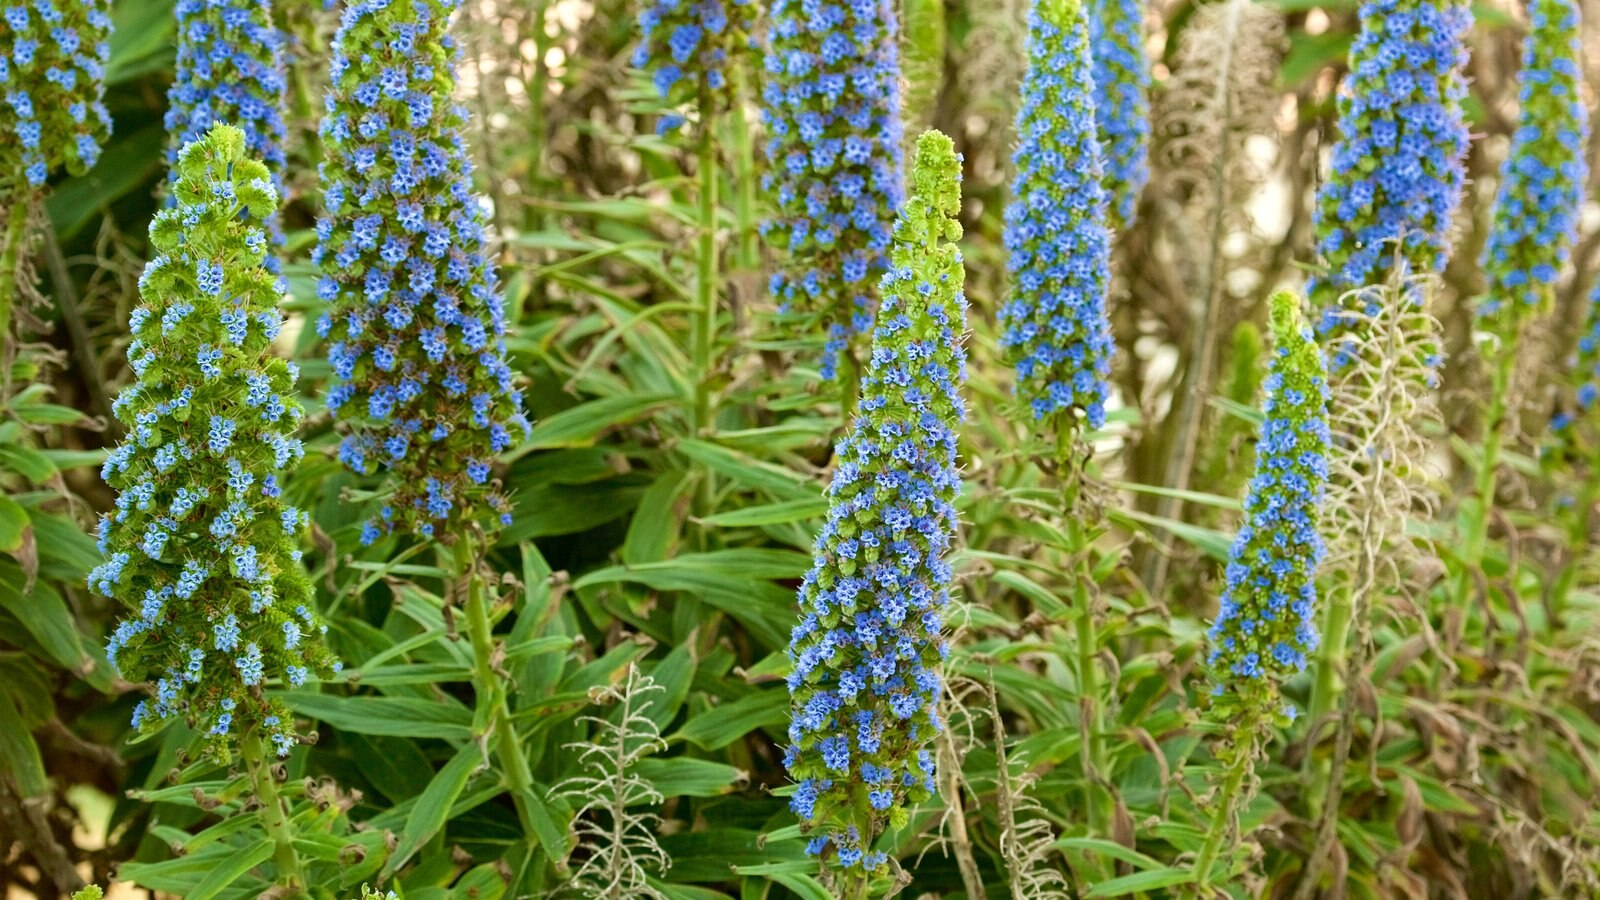 17-Mile Drive caracterizando flores silvestres